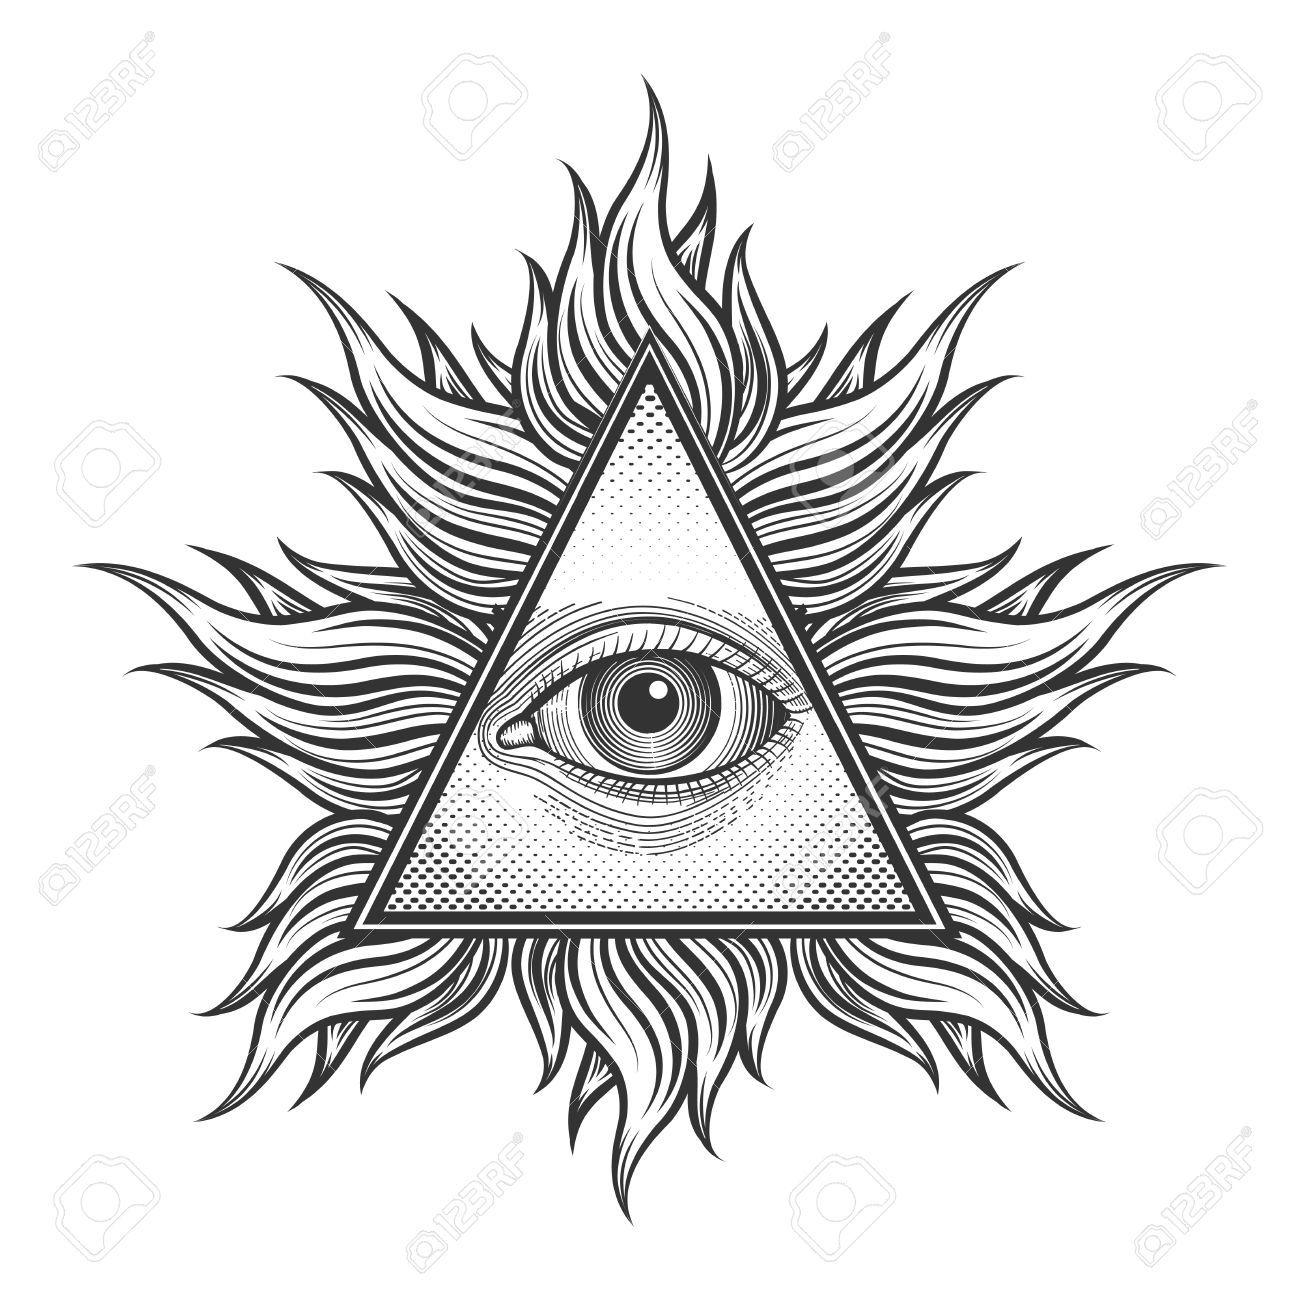 43676022-All-seeing-eye-pyramid-symbol-in-the-engraving-tattoo-style-Freemason-and-spiritual-illuminati-and-r-Stock-Vector.jpg (1299×1300)